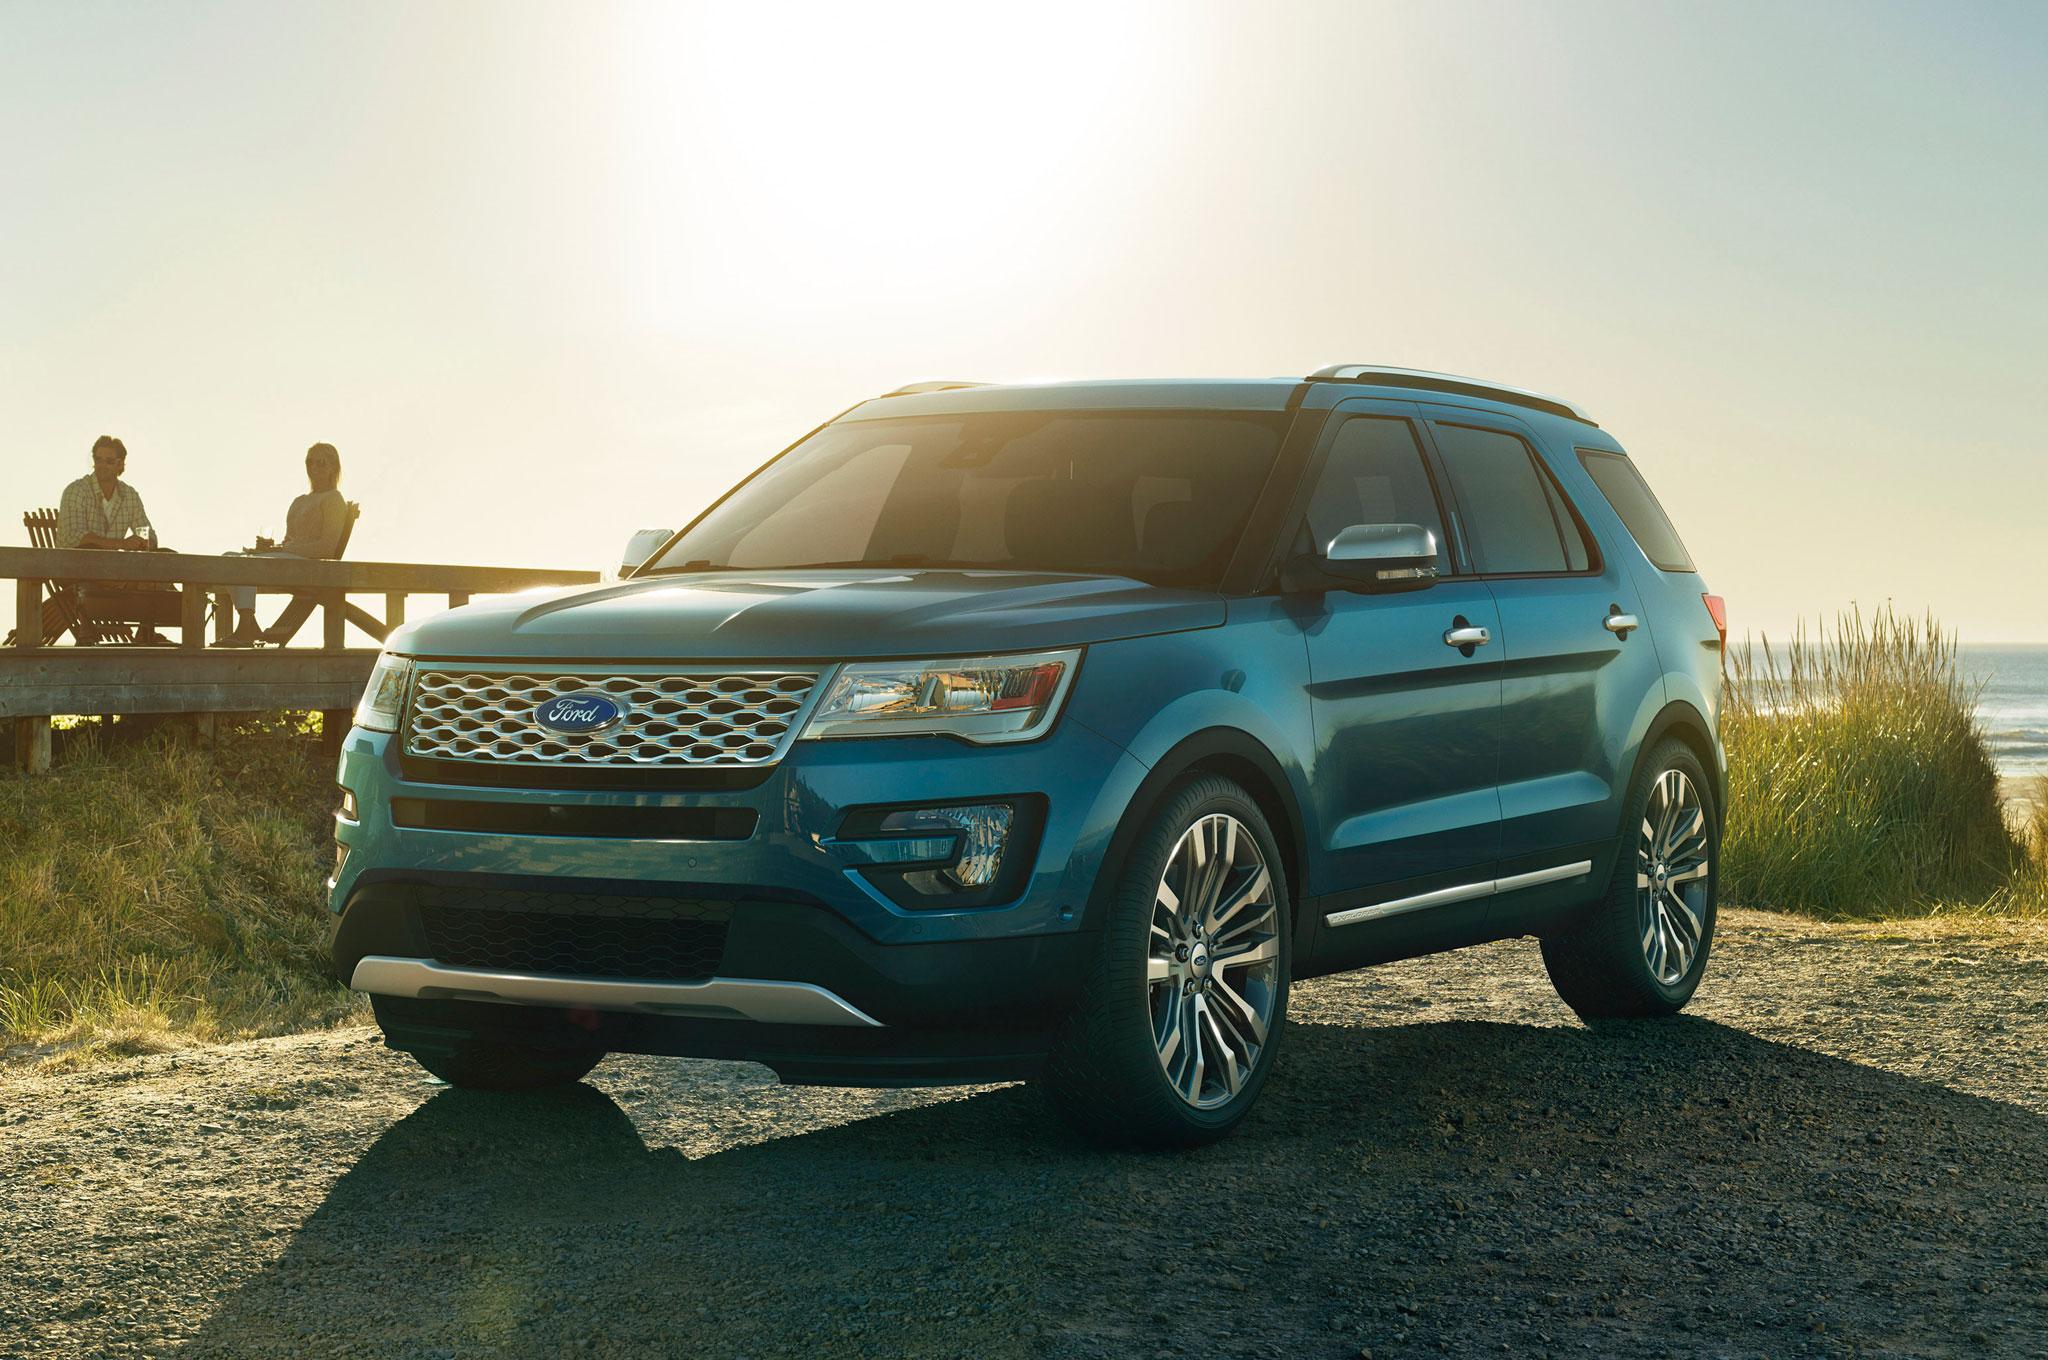 2016 Ford Explorer Front Three Quarter View 1